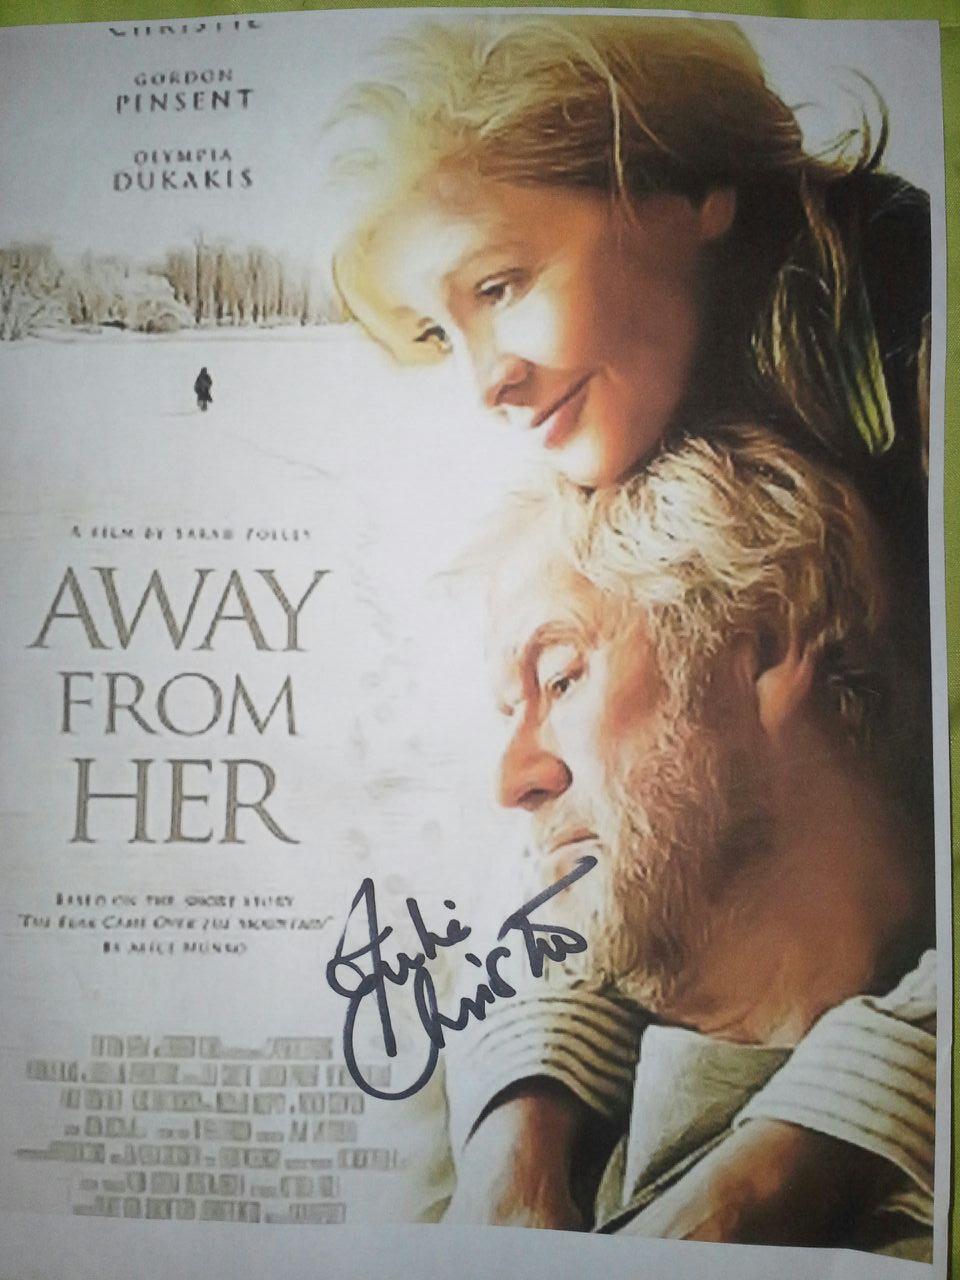 Julie Christie [Actress]